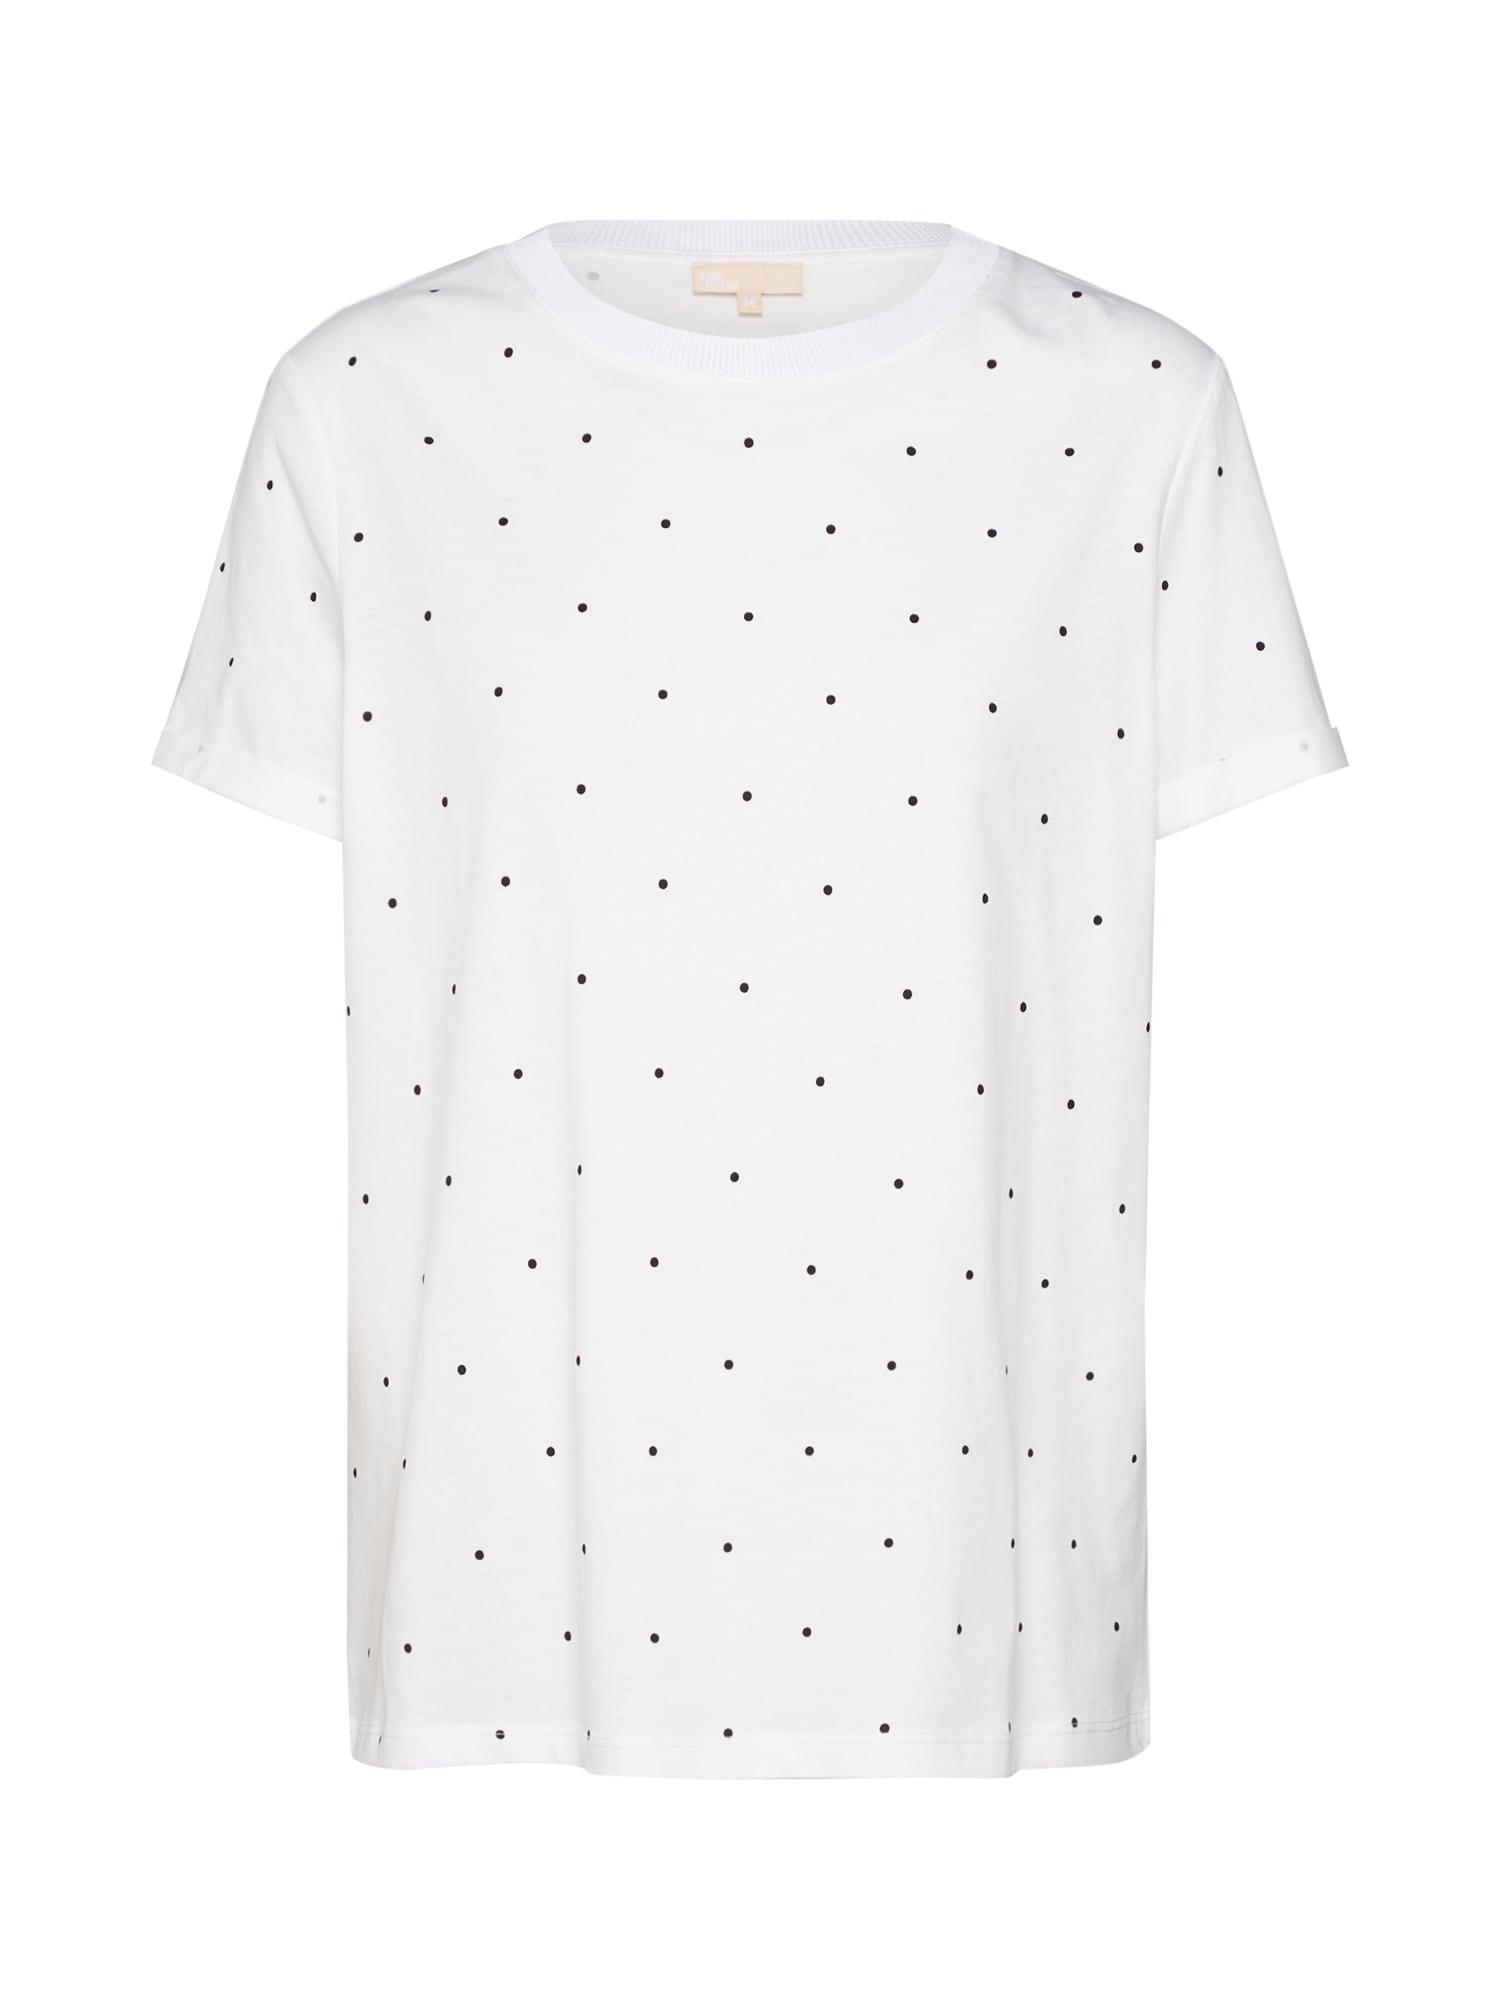 Tričko černá bílá Talkabout